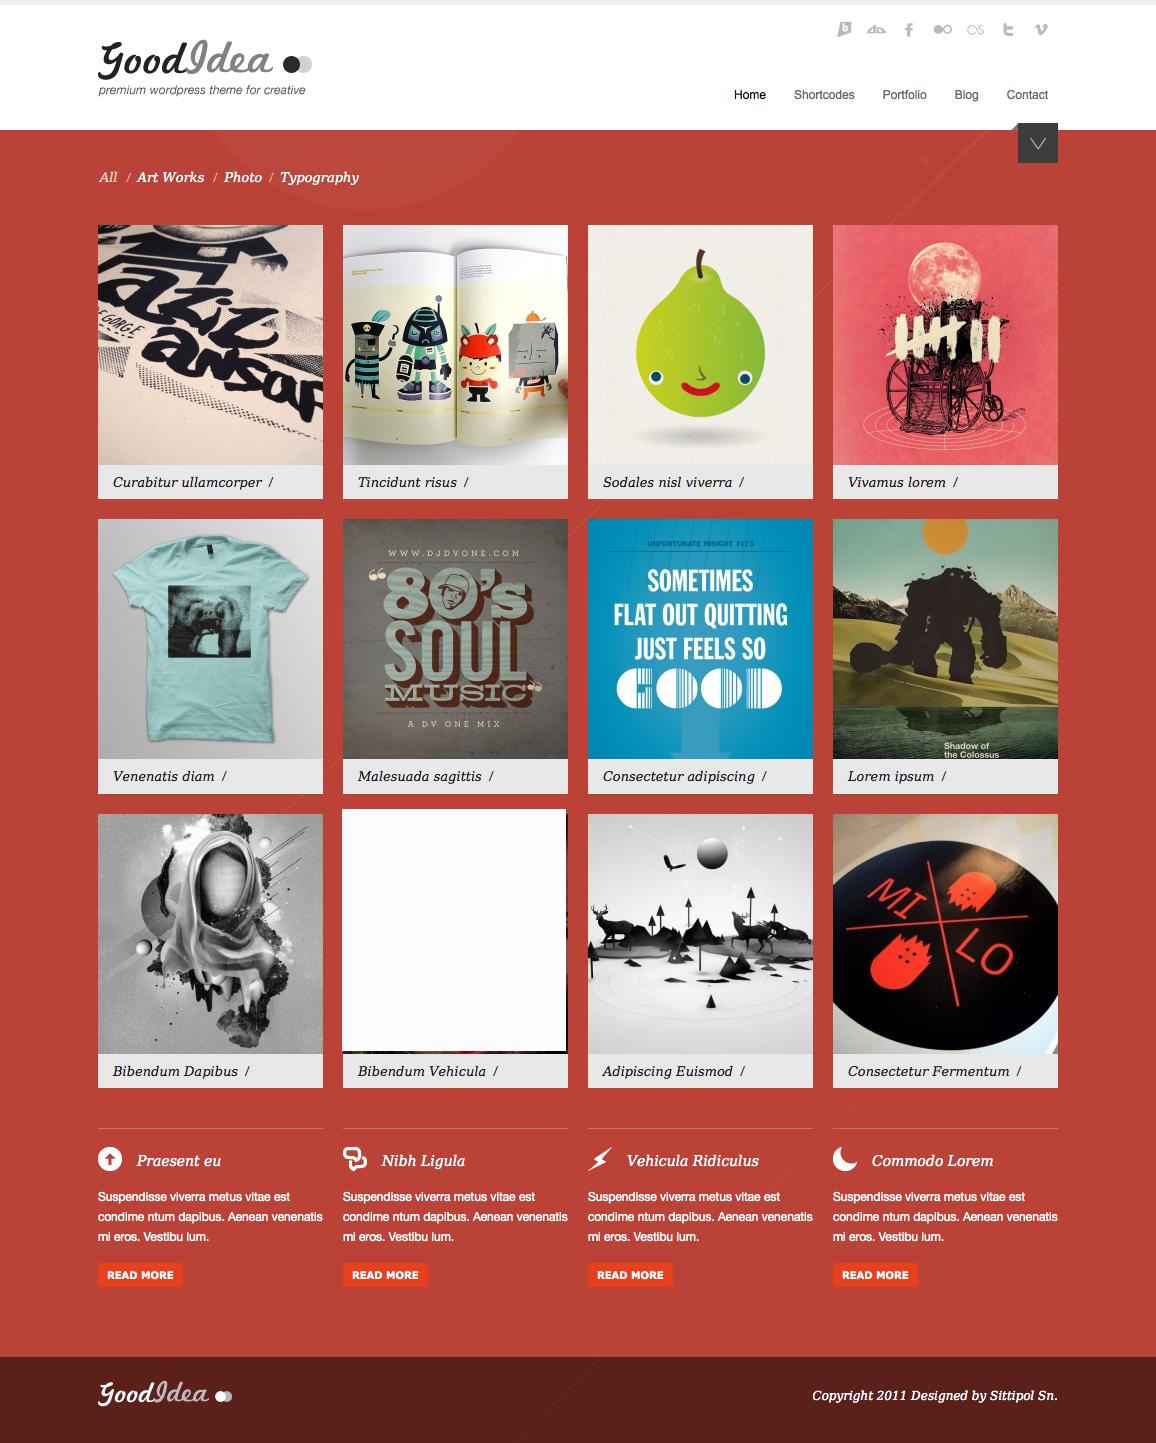 Goodidea - creative wordpress theme - homepage with orange